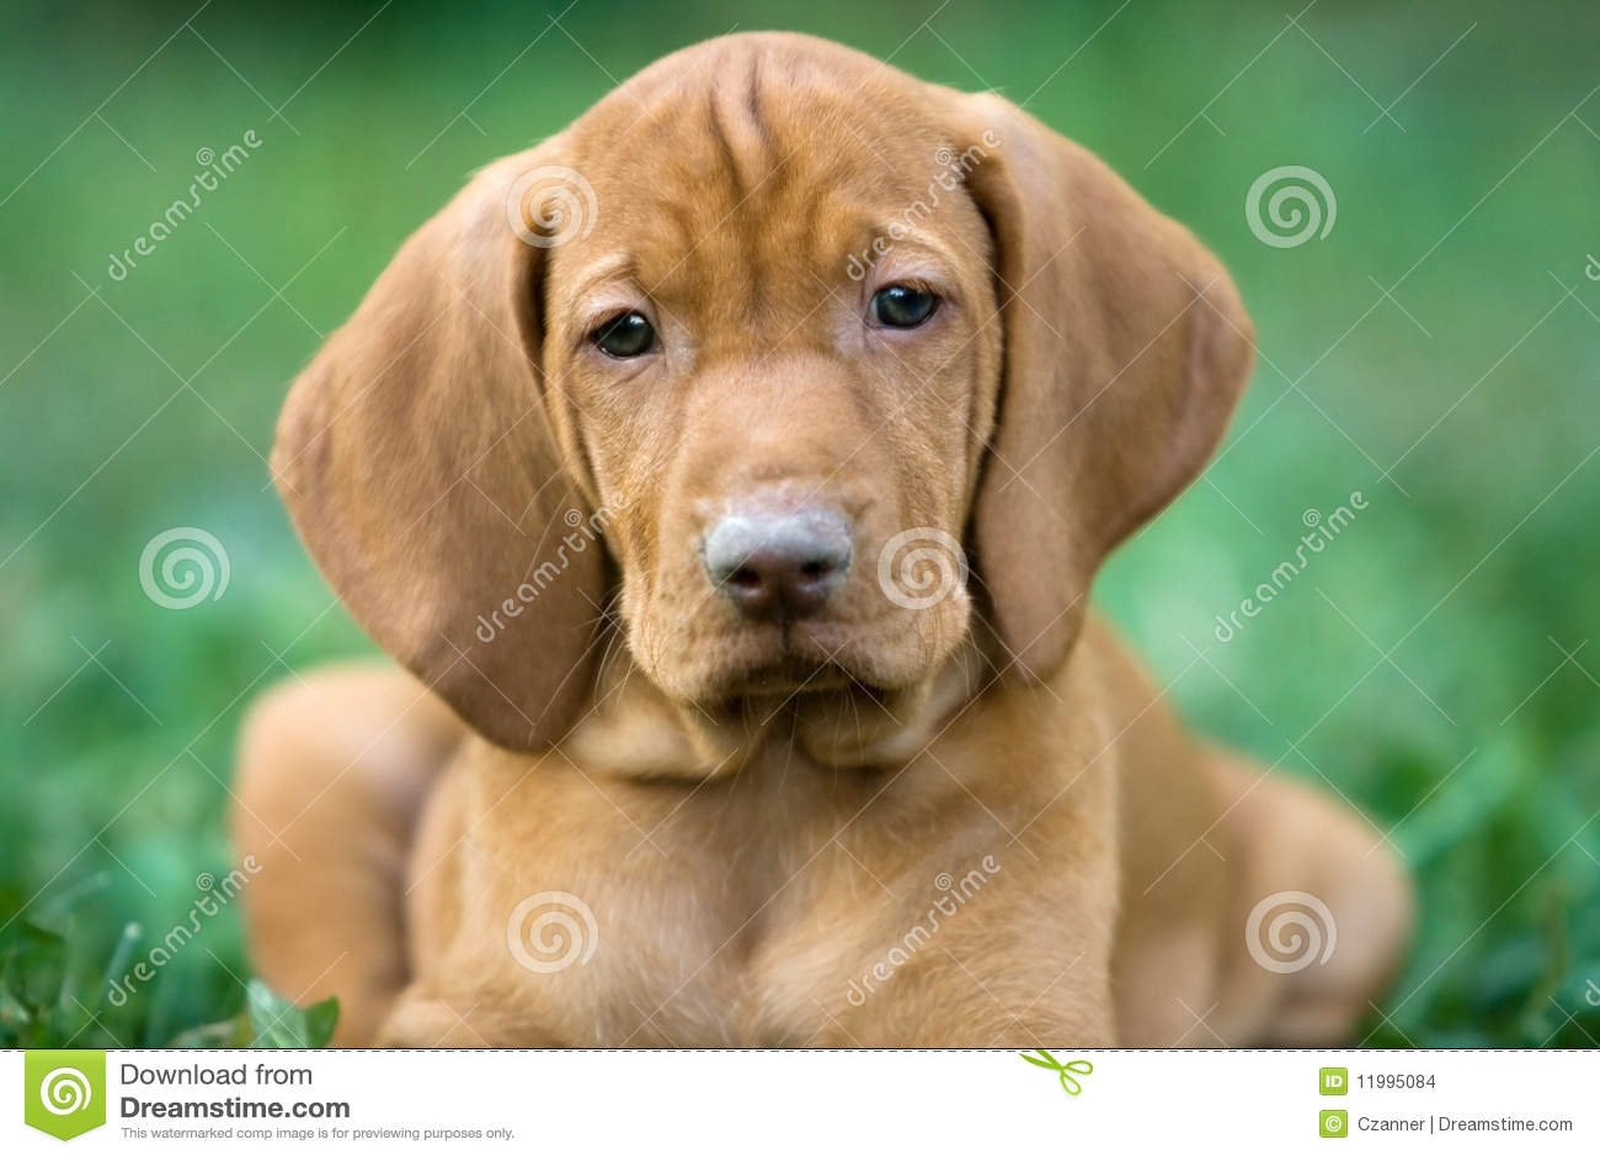 Hungarian viszla puppy stock photo image of pedigreed 11995084 hungarian viszla puppy pedigreed hungary nvjuhfo Gallery